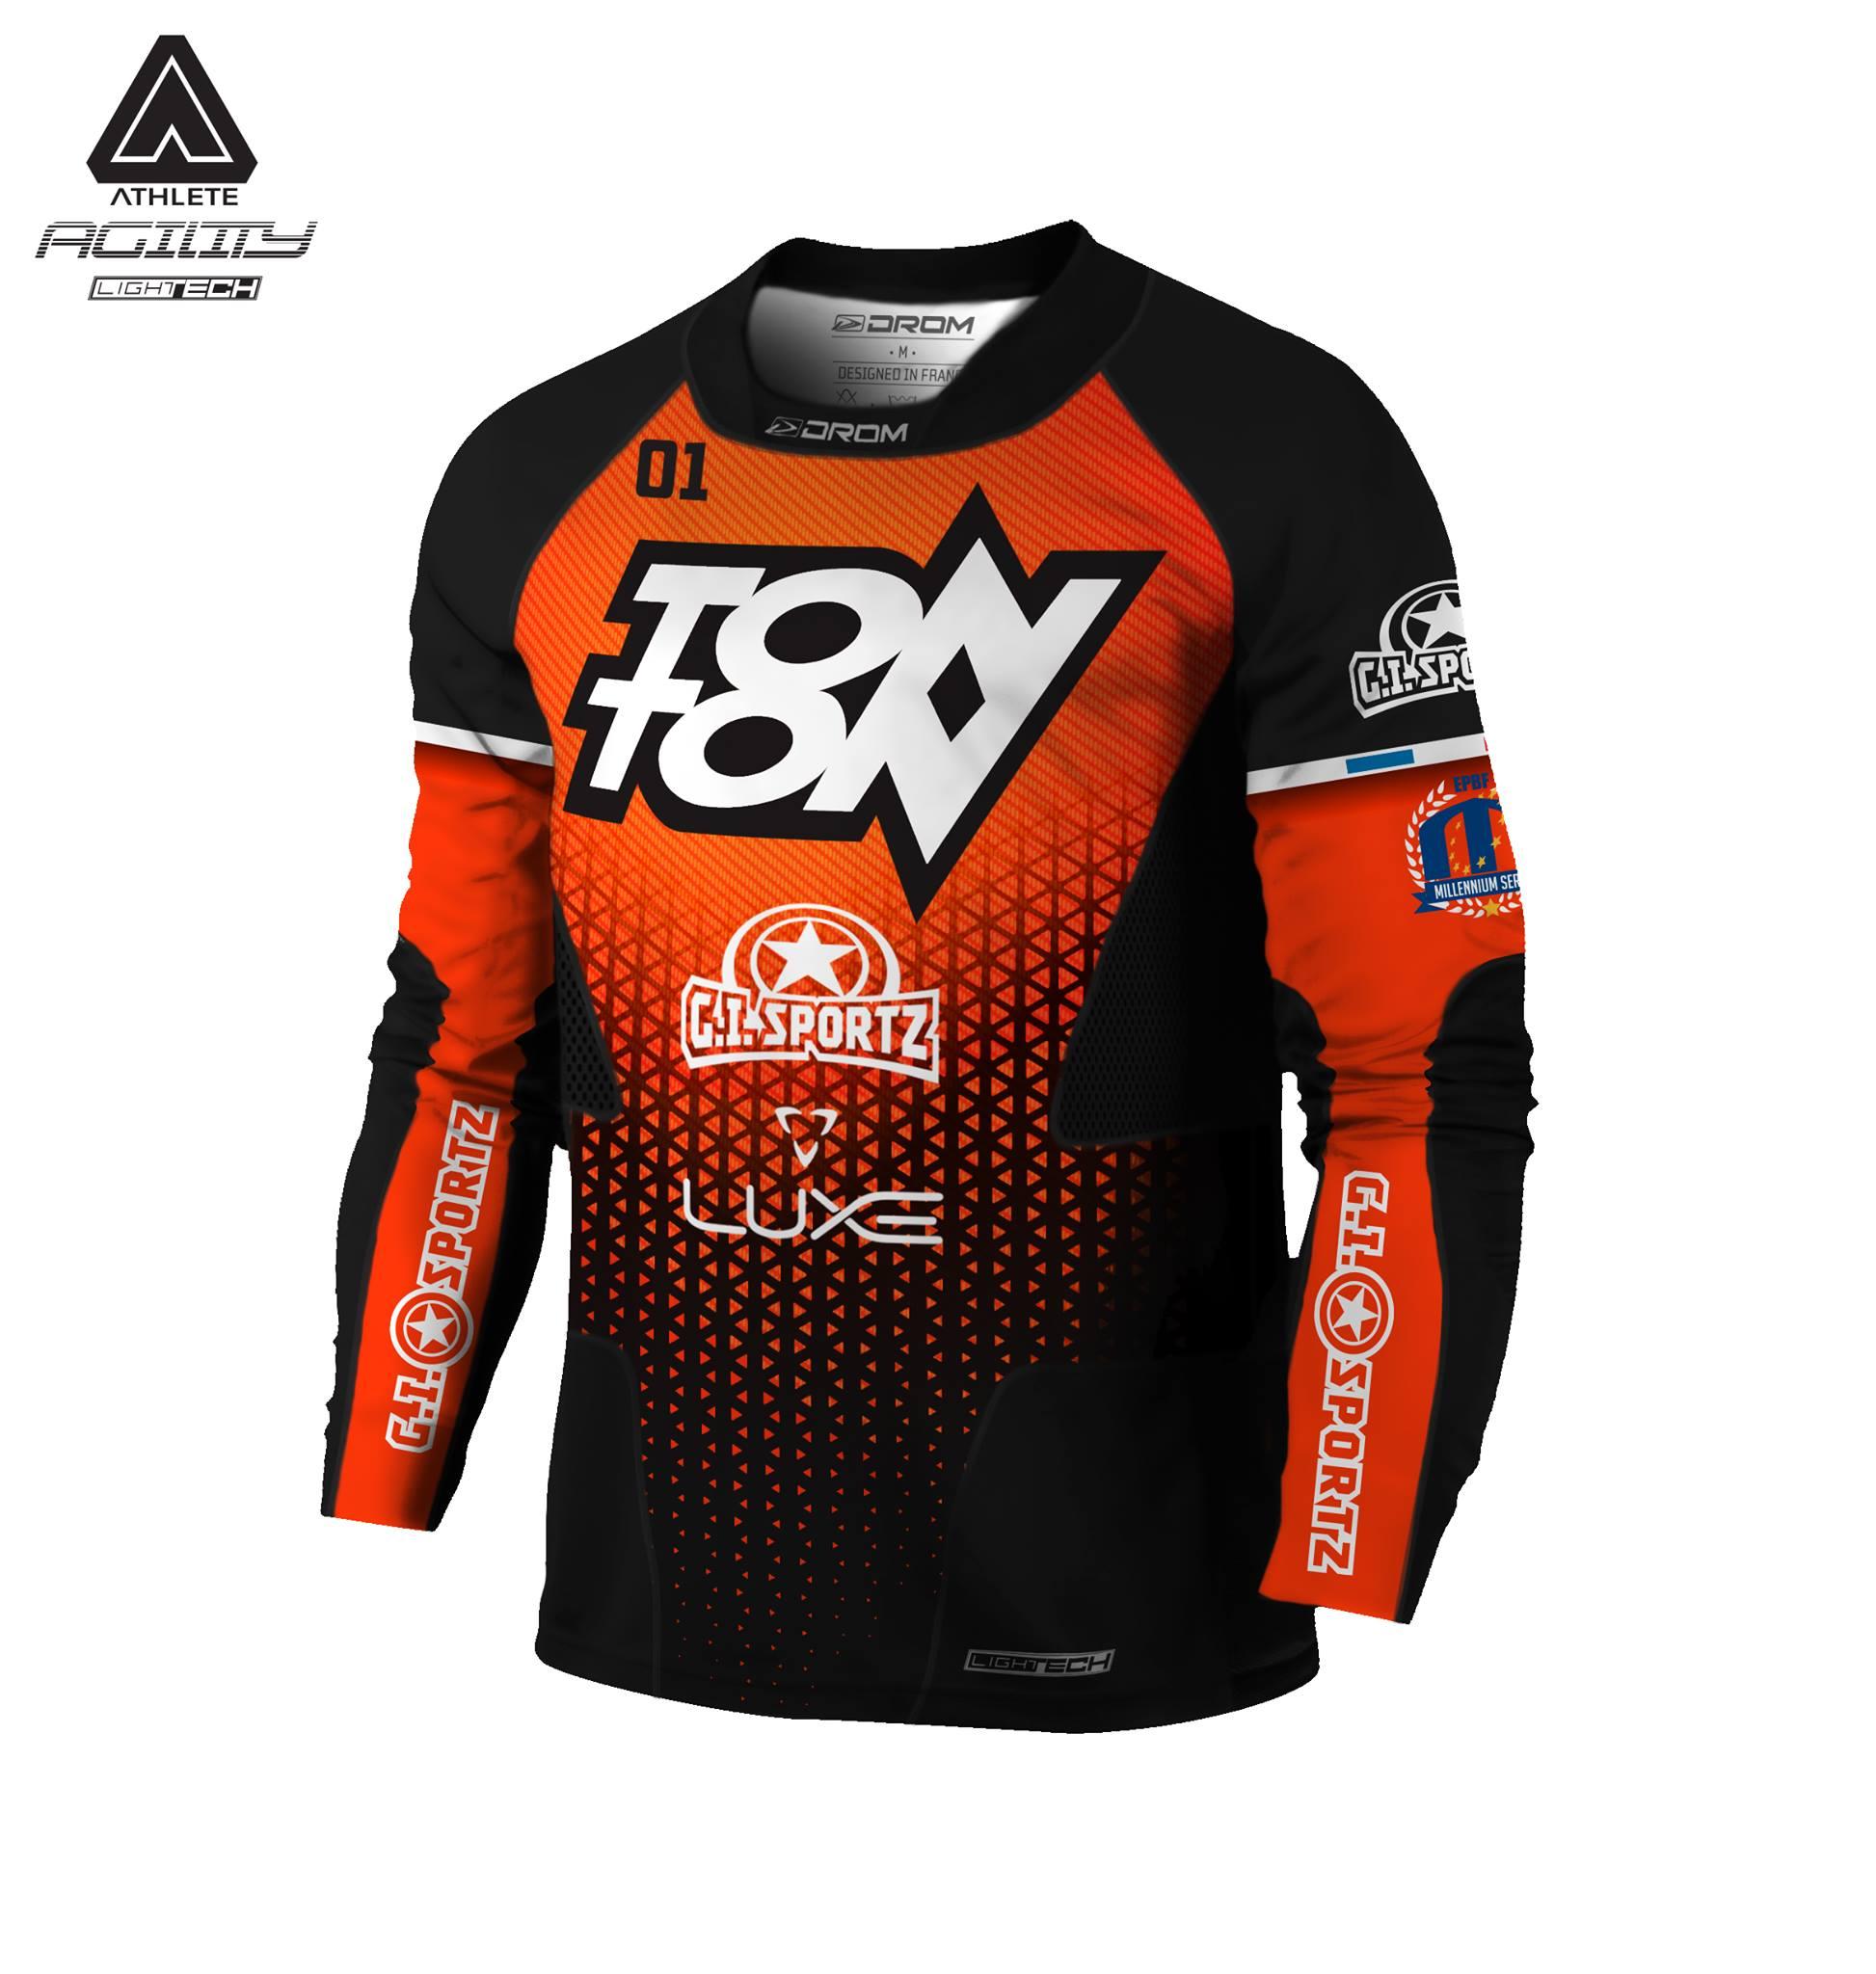 ton-ton-drom-2016-jersey